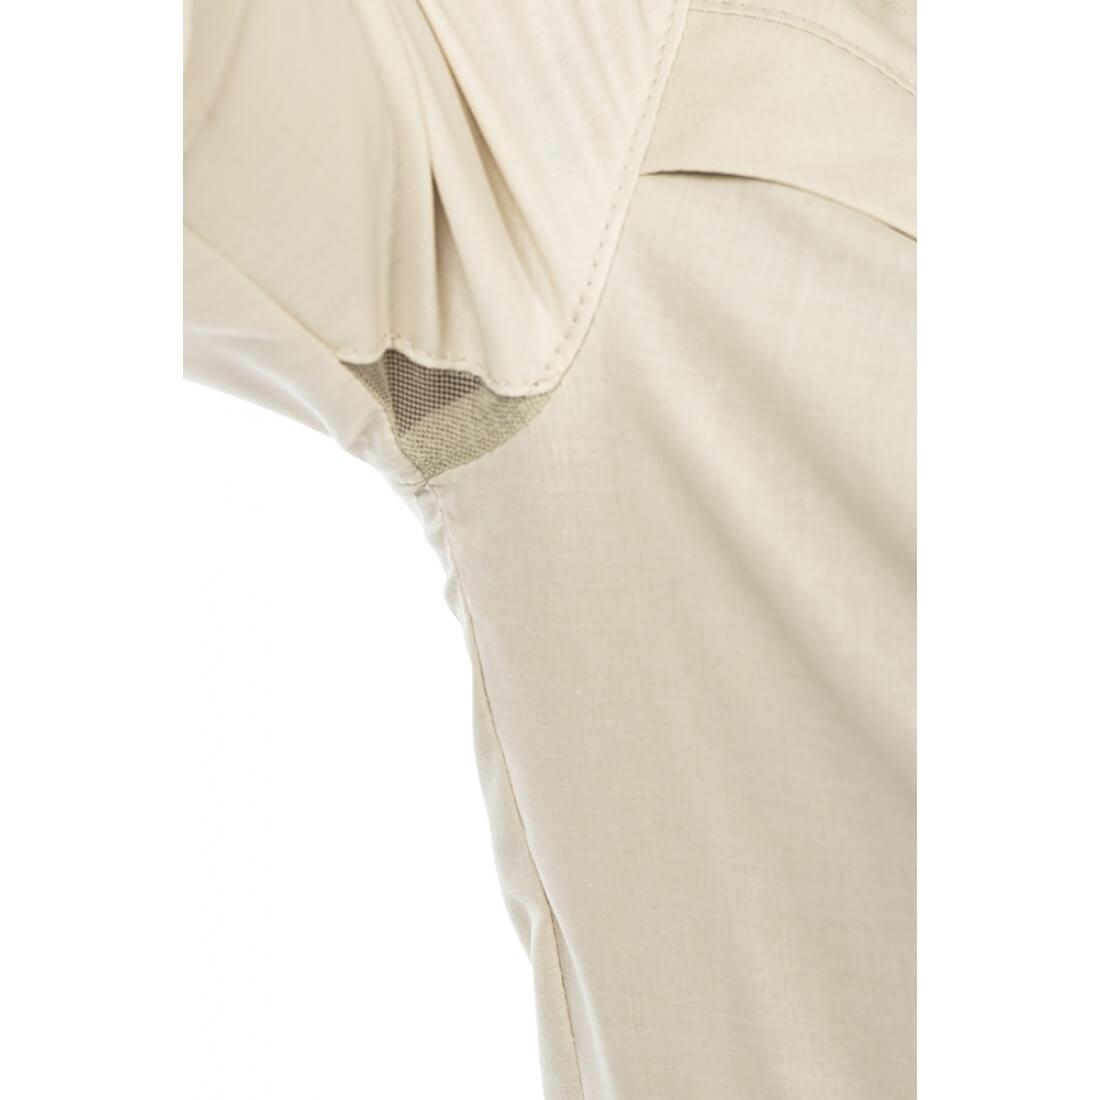 Женская блузка Биостоп® Комфорт